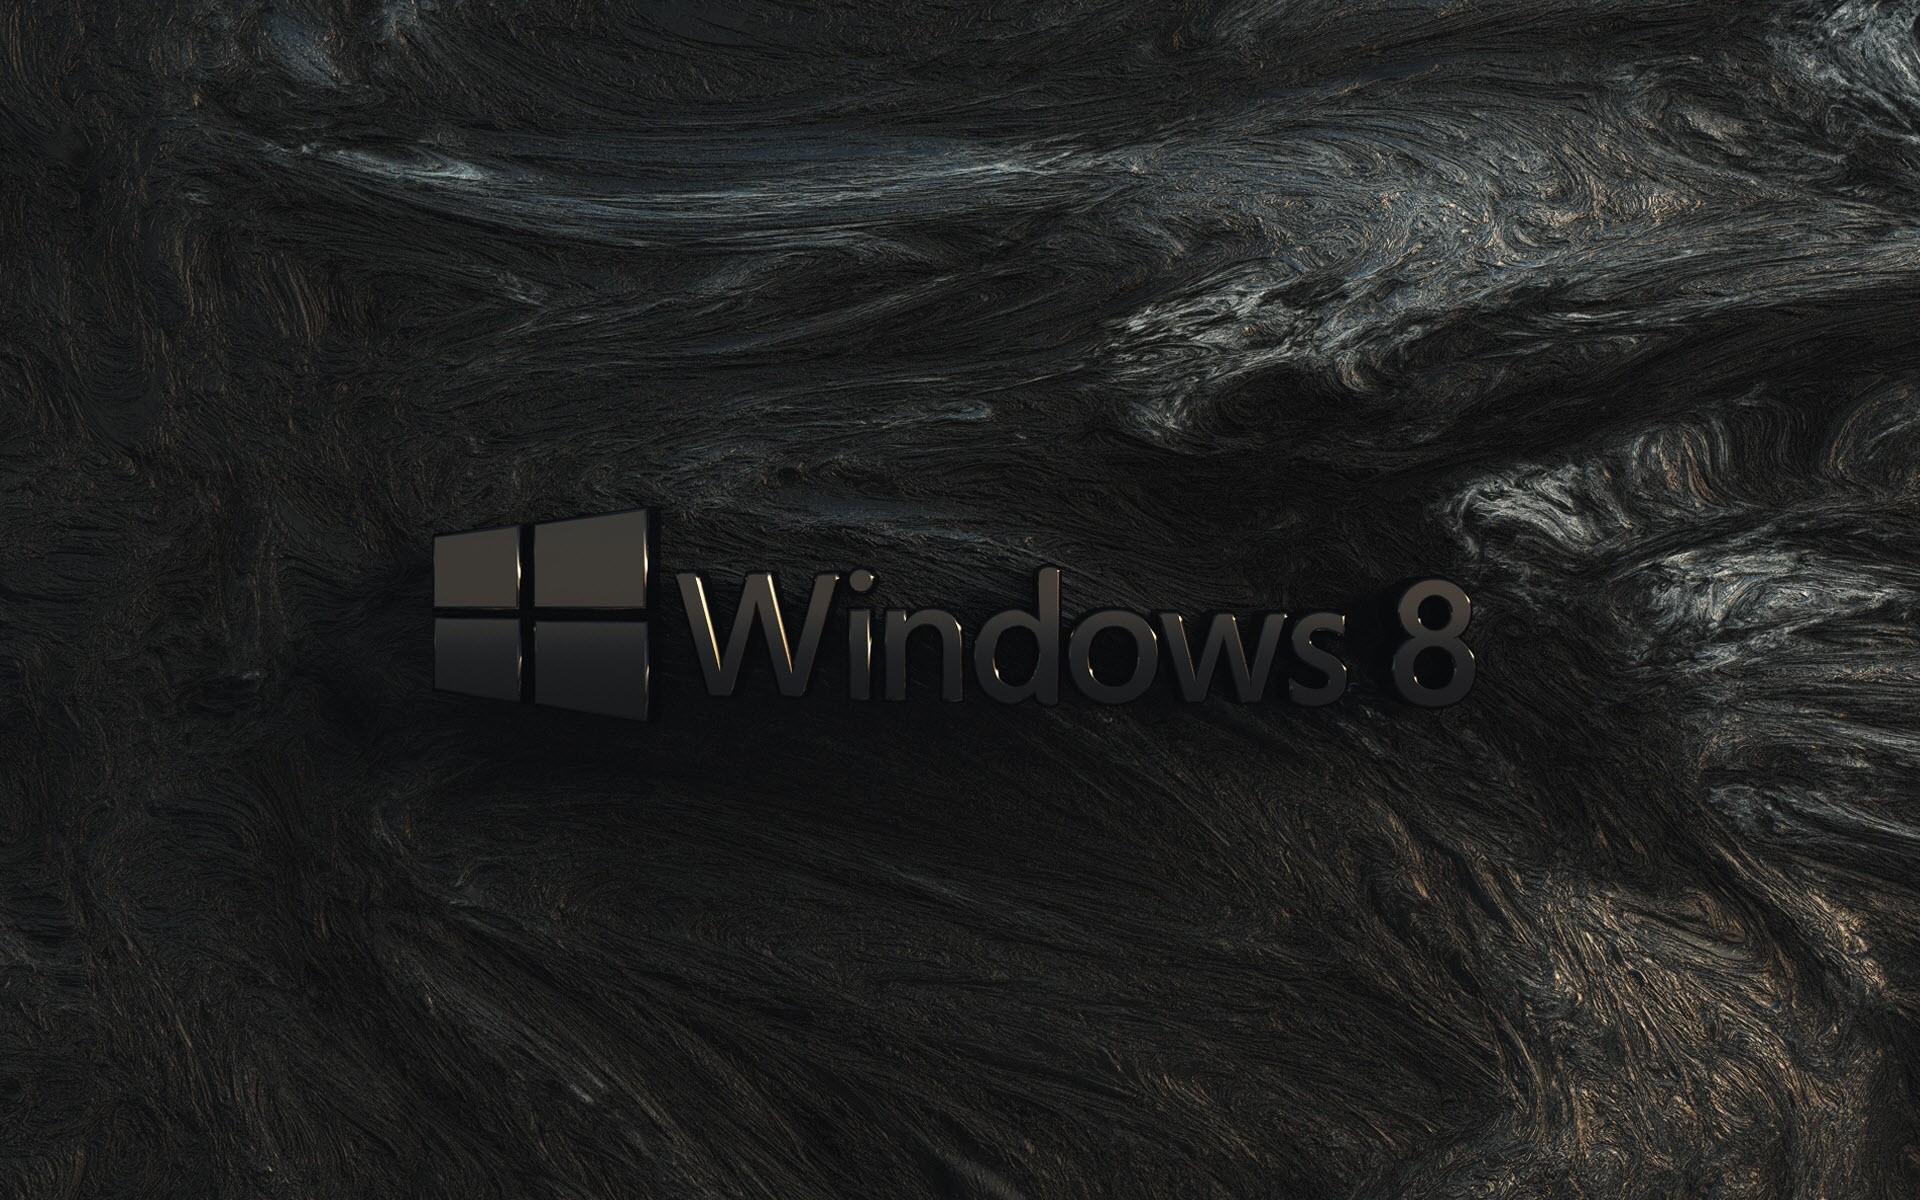 Full HD p Windows Wallpapers HD Desktop Backgrounds | HD Wallpapers |  Pinterest | Windows wallpaper, Hd wallpaper and Wallpaper